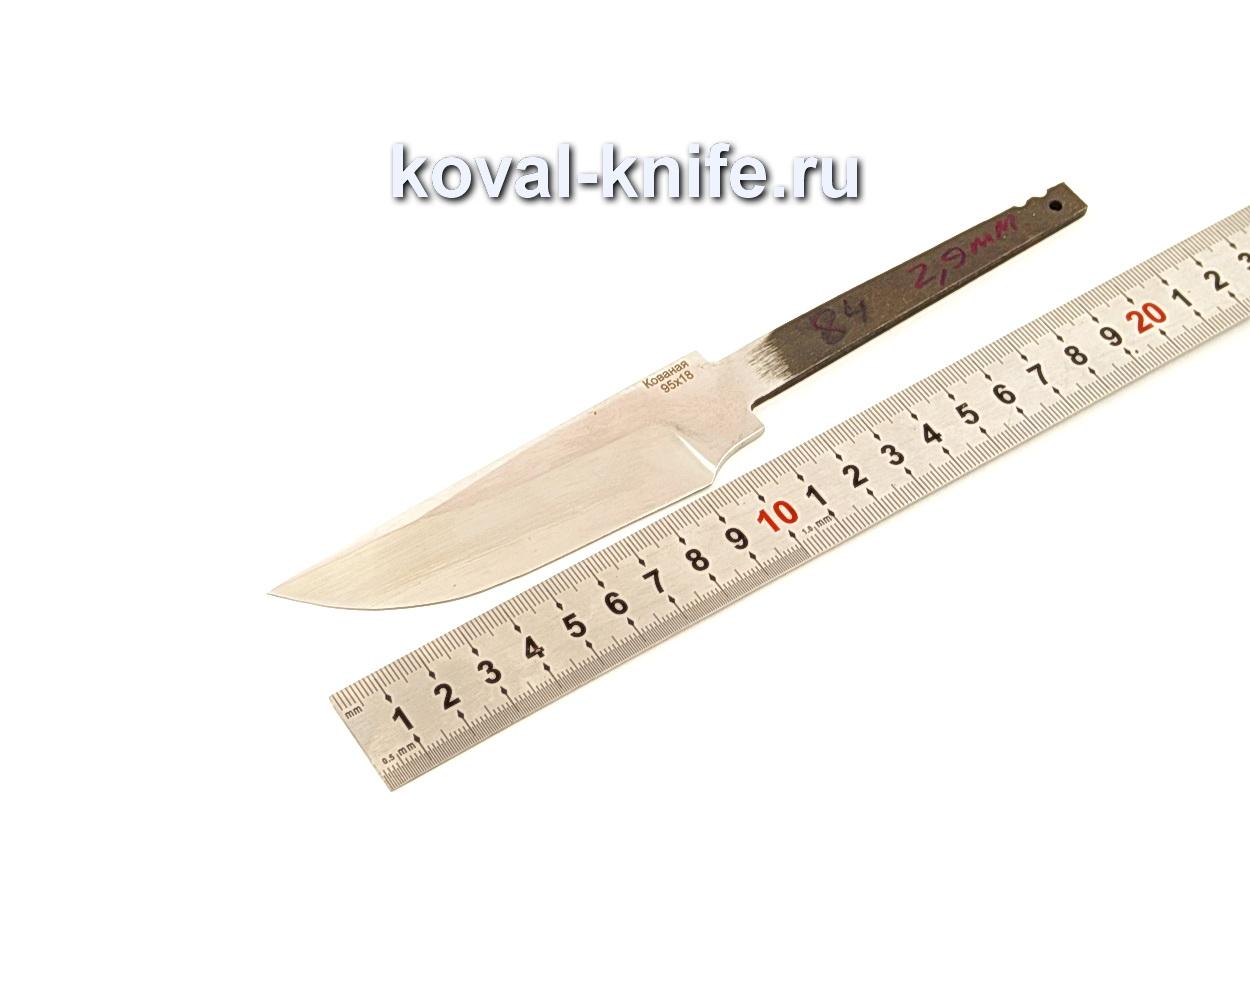 Клинок для ножа из кованой 95Х18 N84